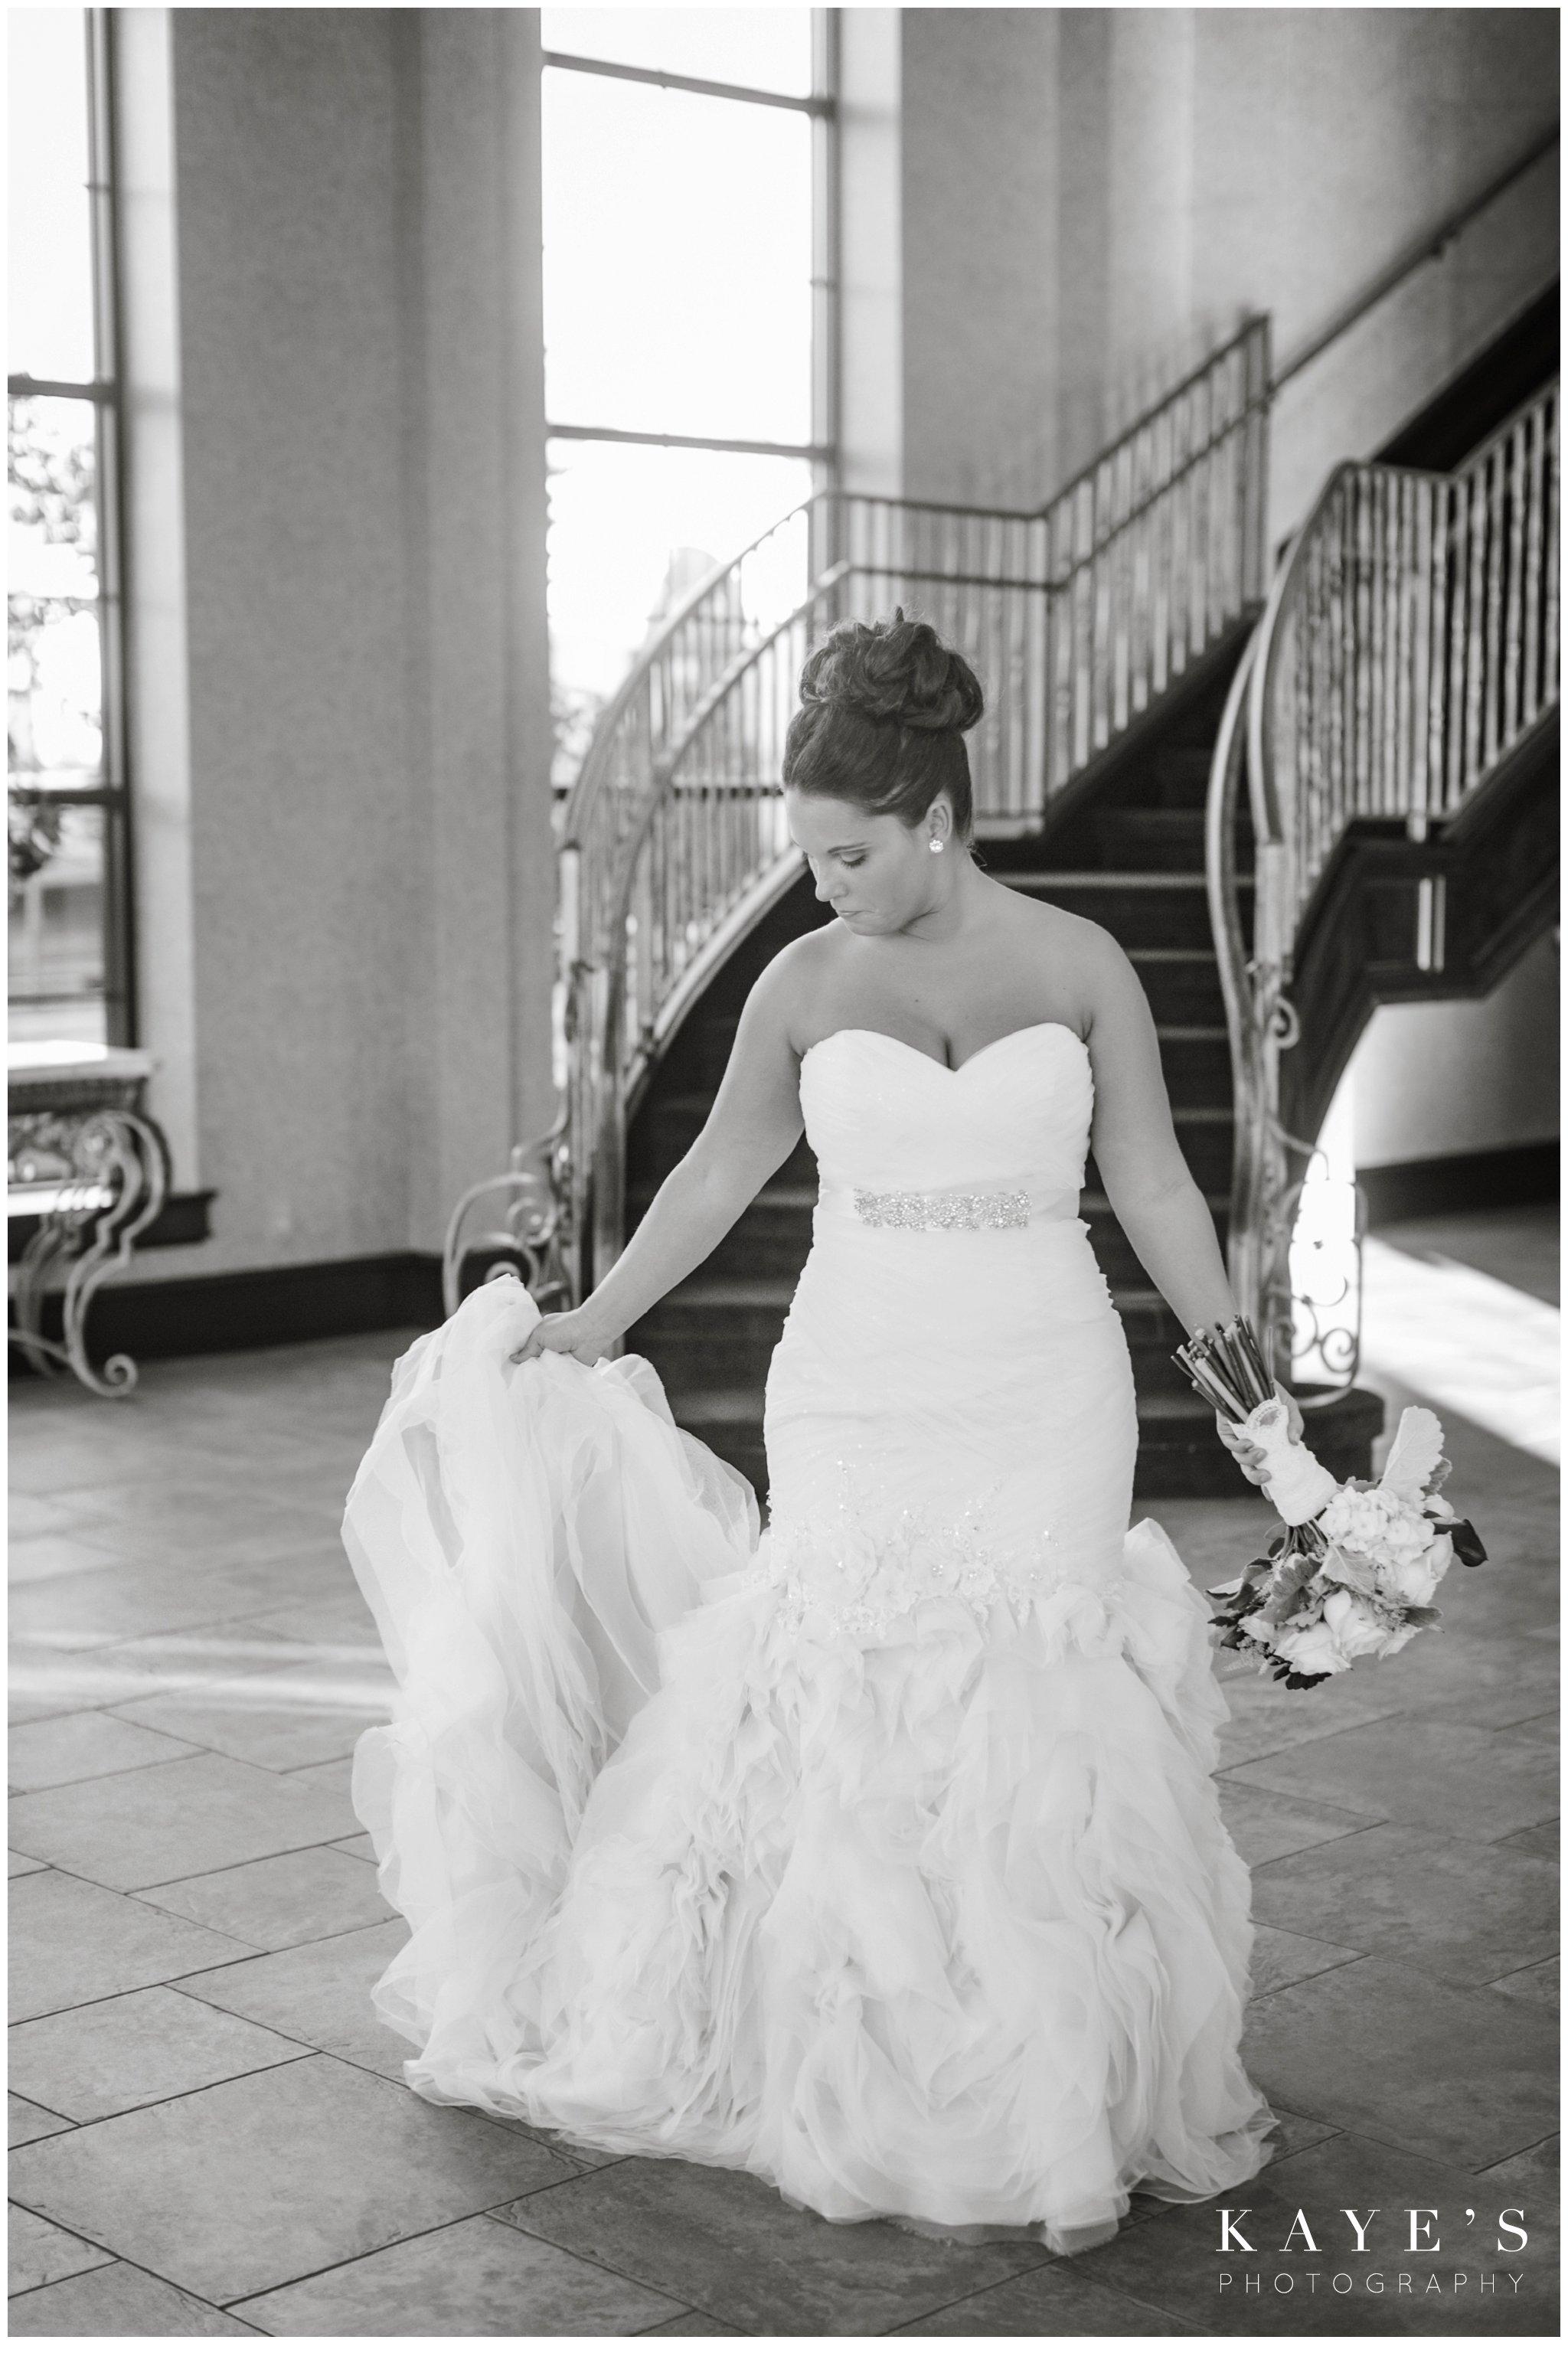 Kayes Photography- howell-michigan-wedding-photographer_0647.jpg